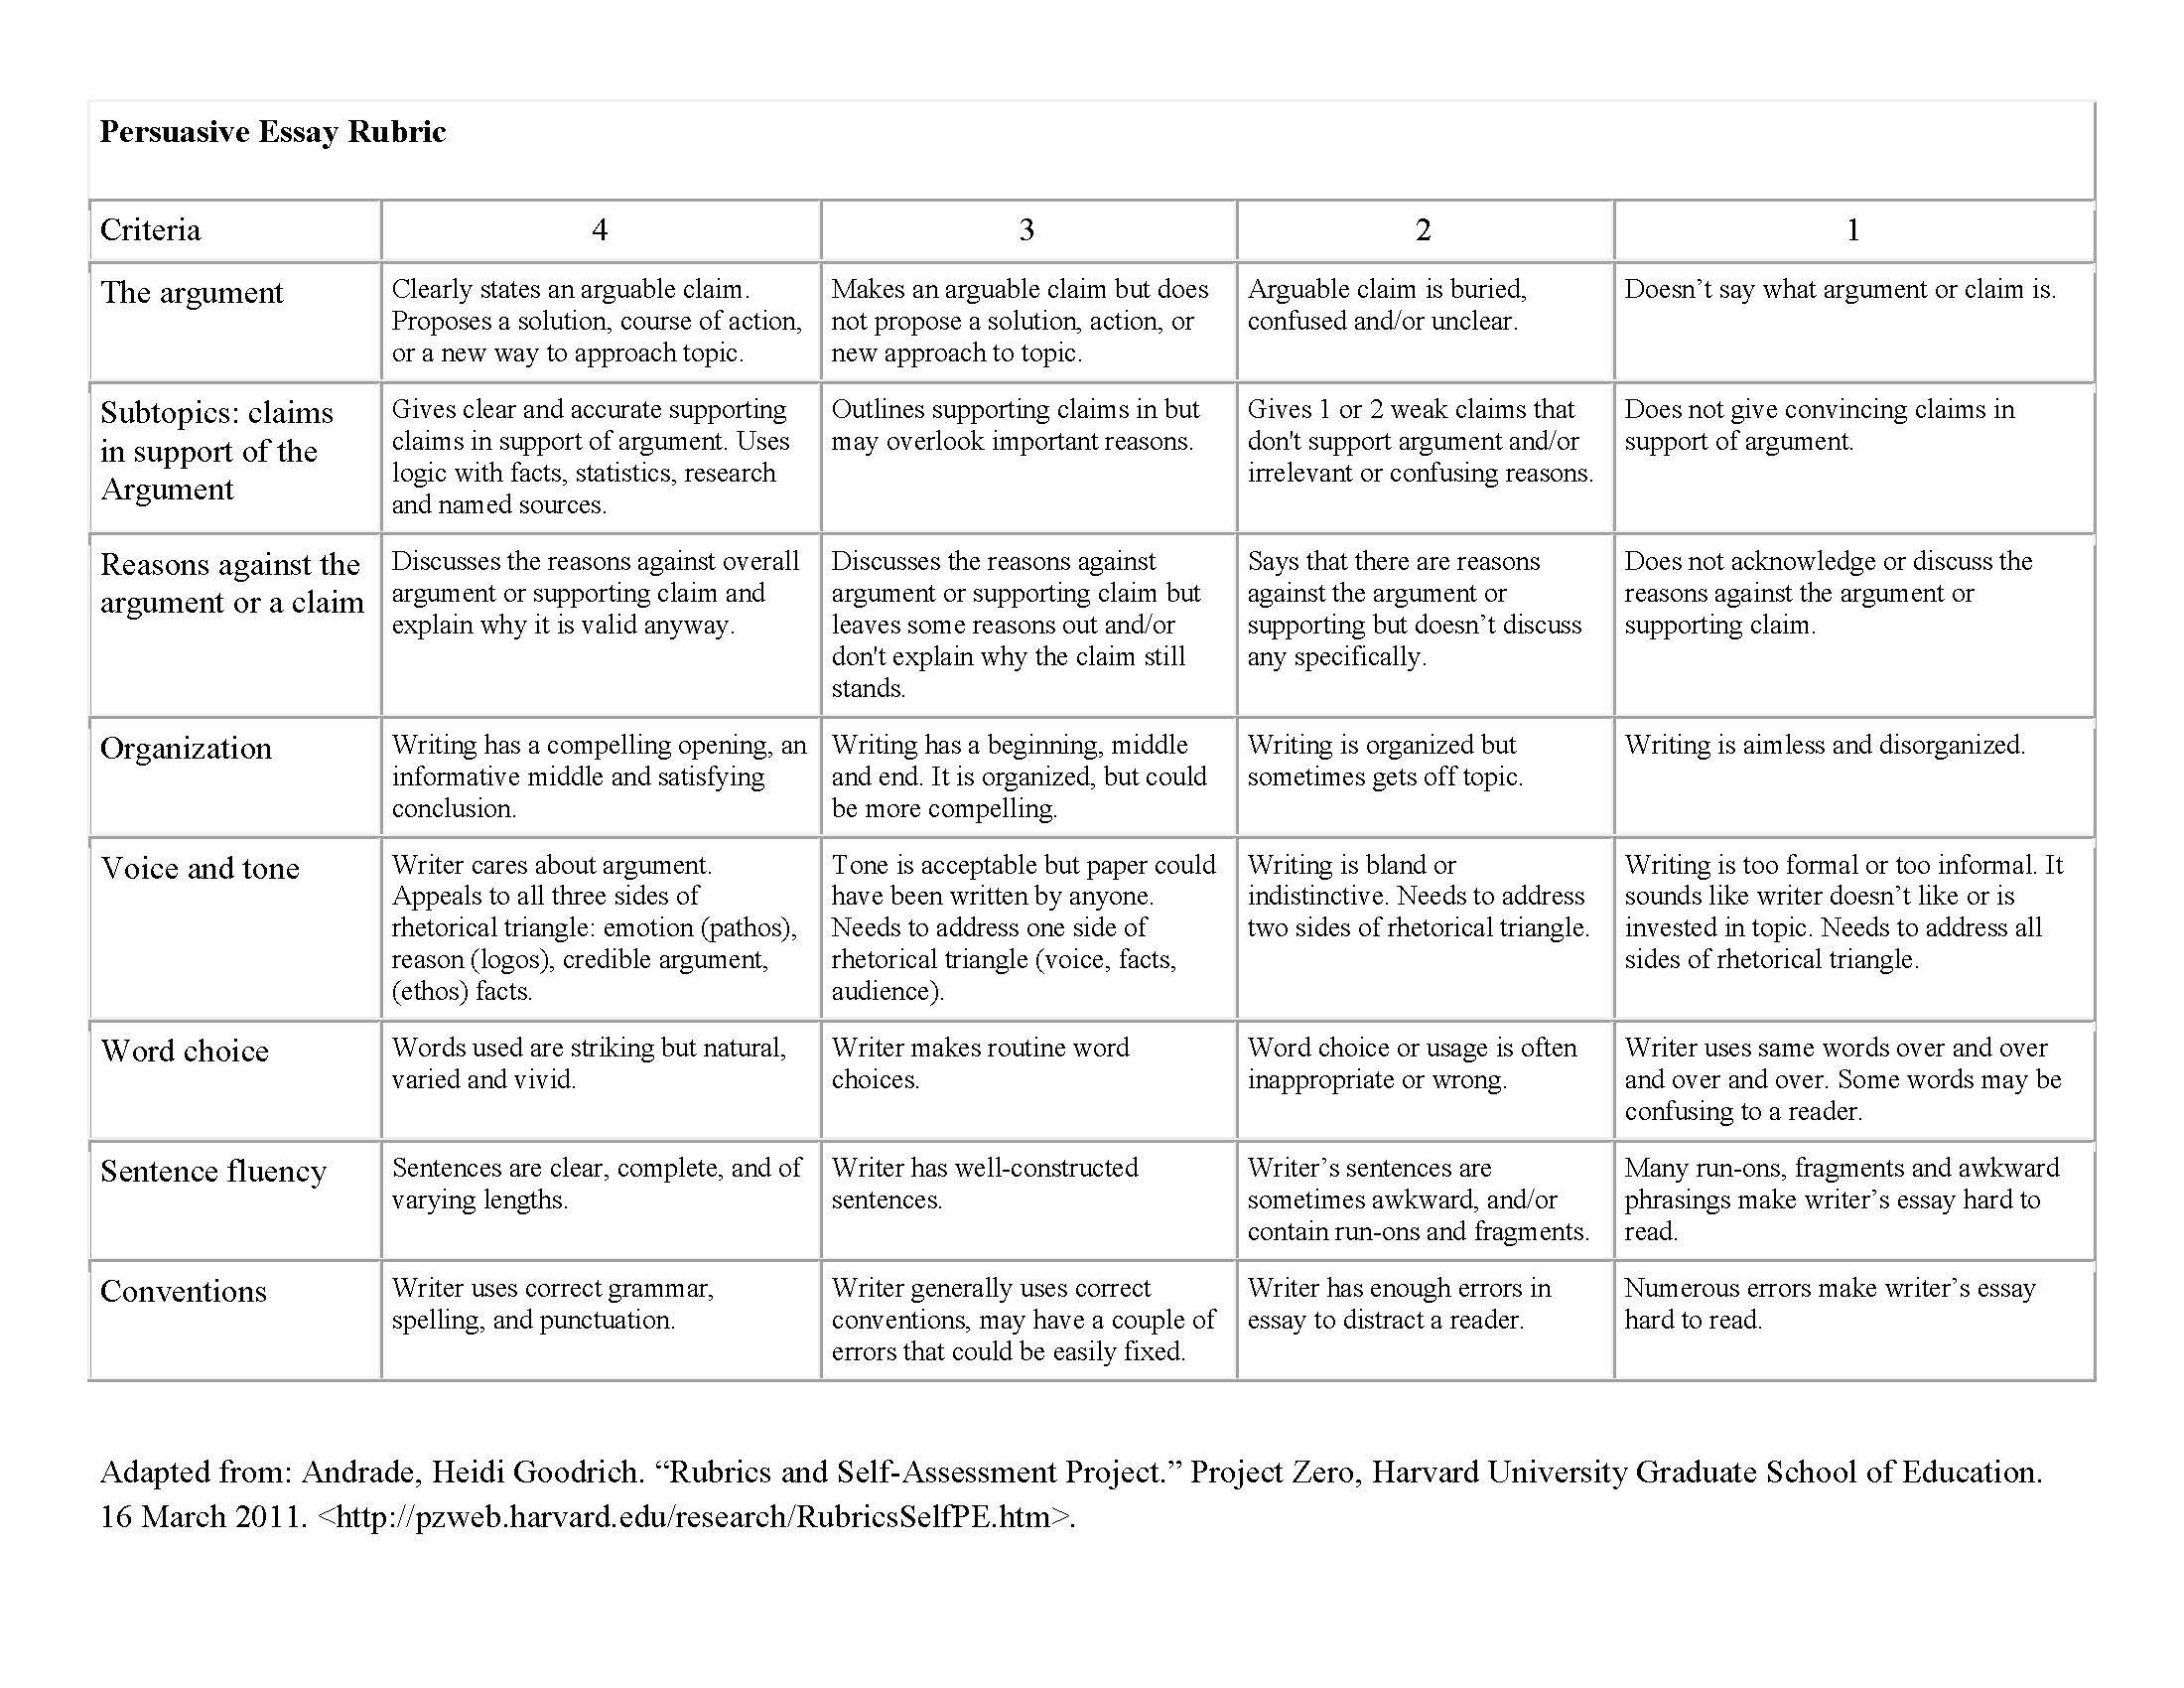 009 Essay Example Argumentative Examples For High School Handout Persuasive Striking Short Topics Full